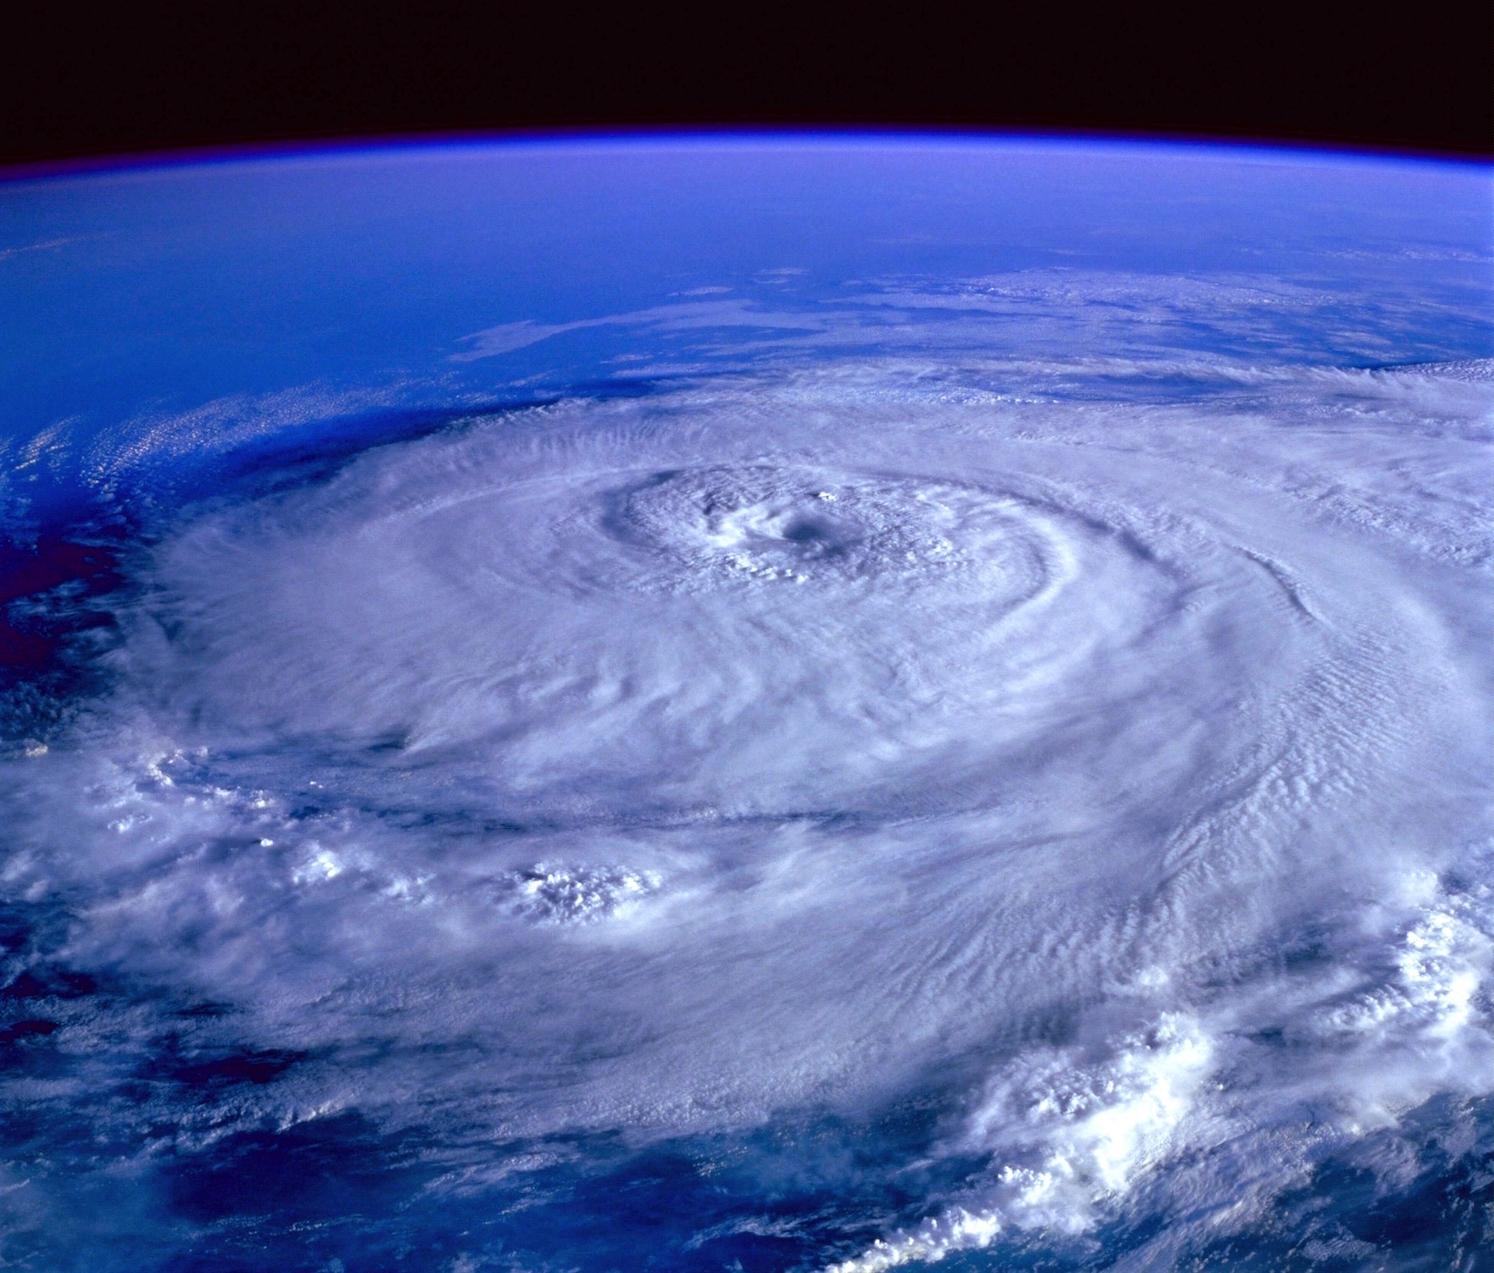 Photo hurricane dreamstime_xxl_88697173 copy.jpg